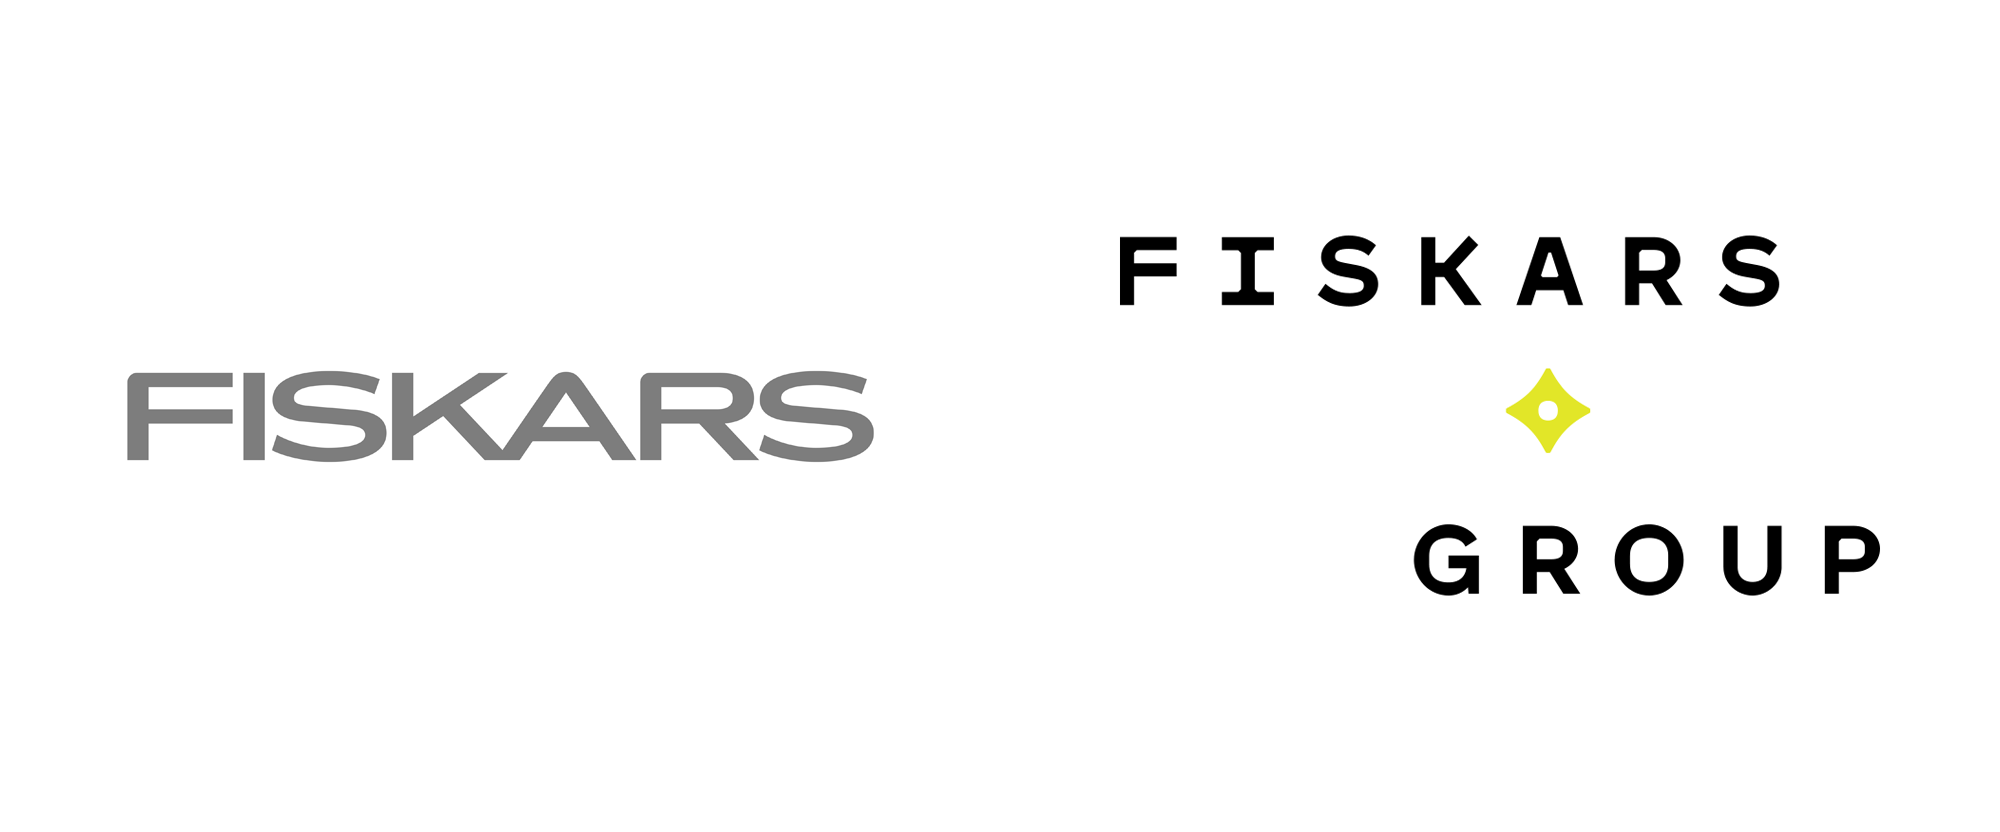 Brand New: New Logo and Identity for Fiskars Group by DesignStudio.